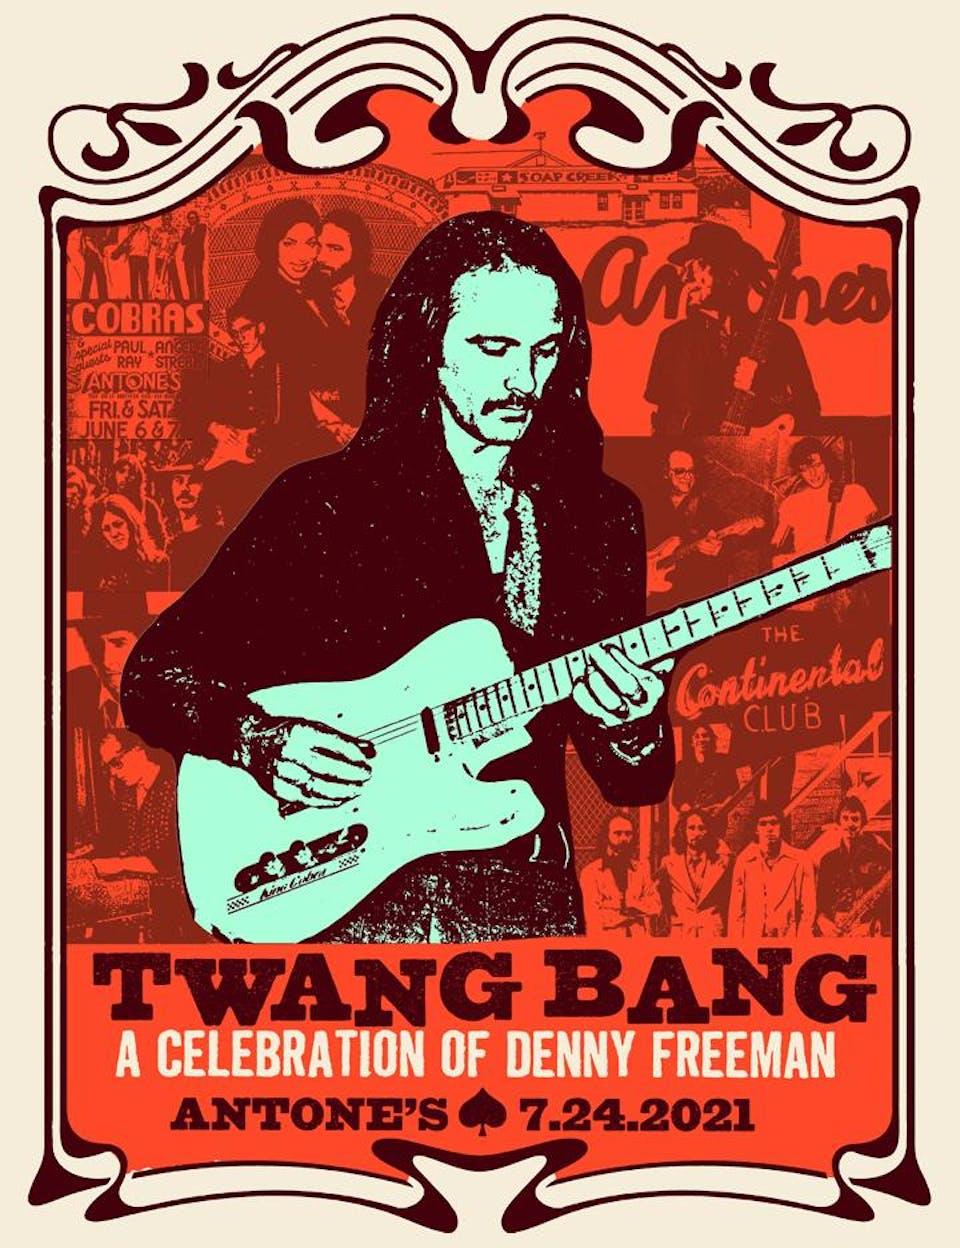 Antone's Anniversary: Twang Bang - A Celebration of Denny Freeman